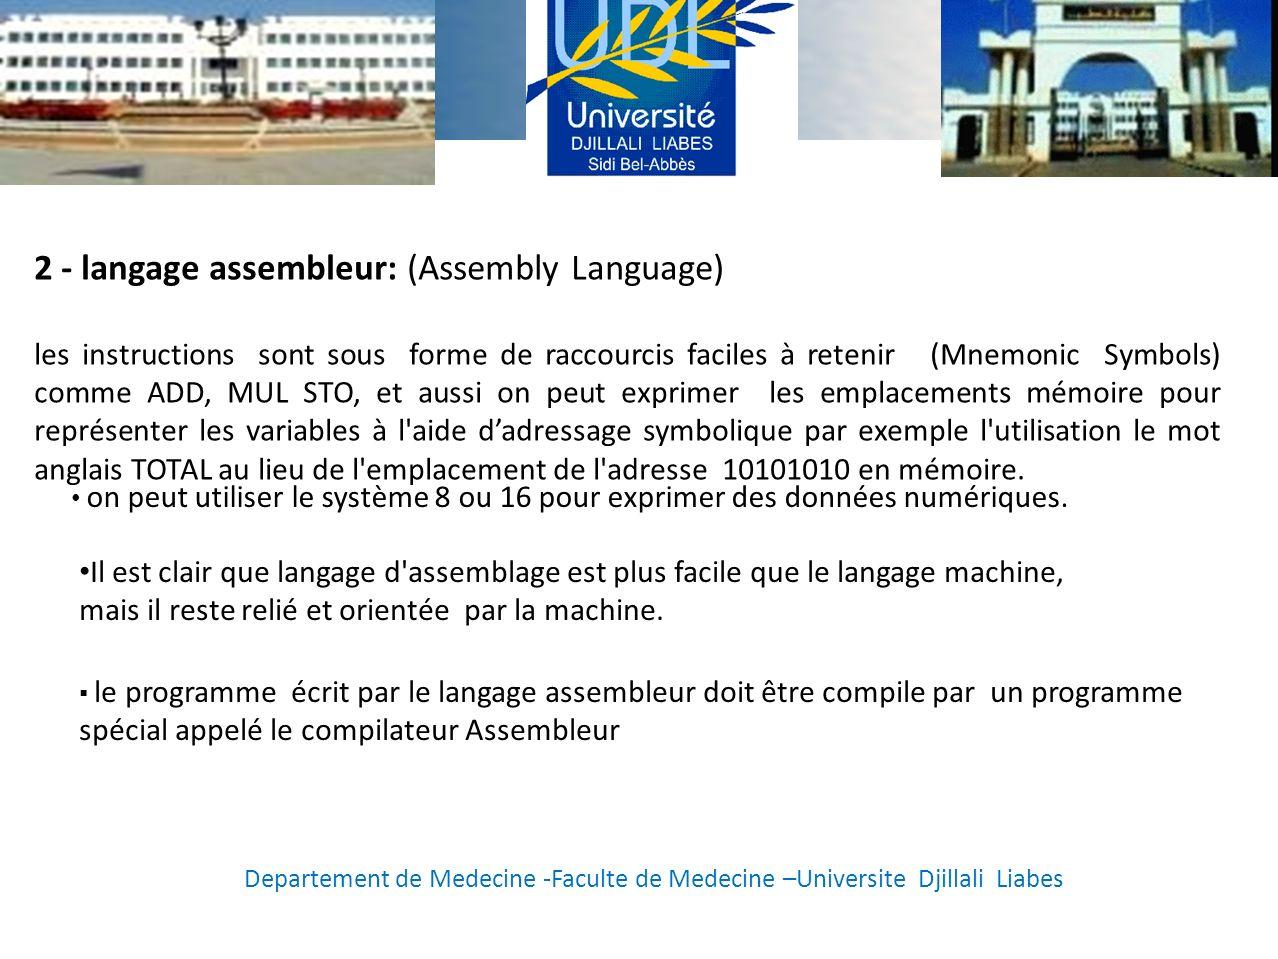 2 - langage assembleur: (Assembly Language)